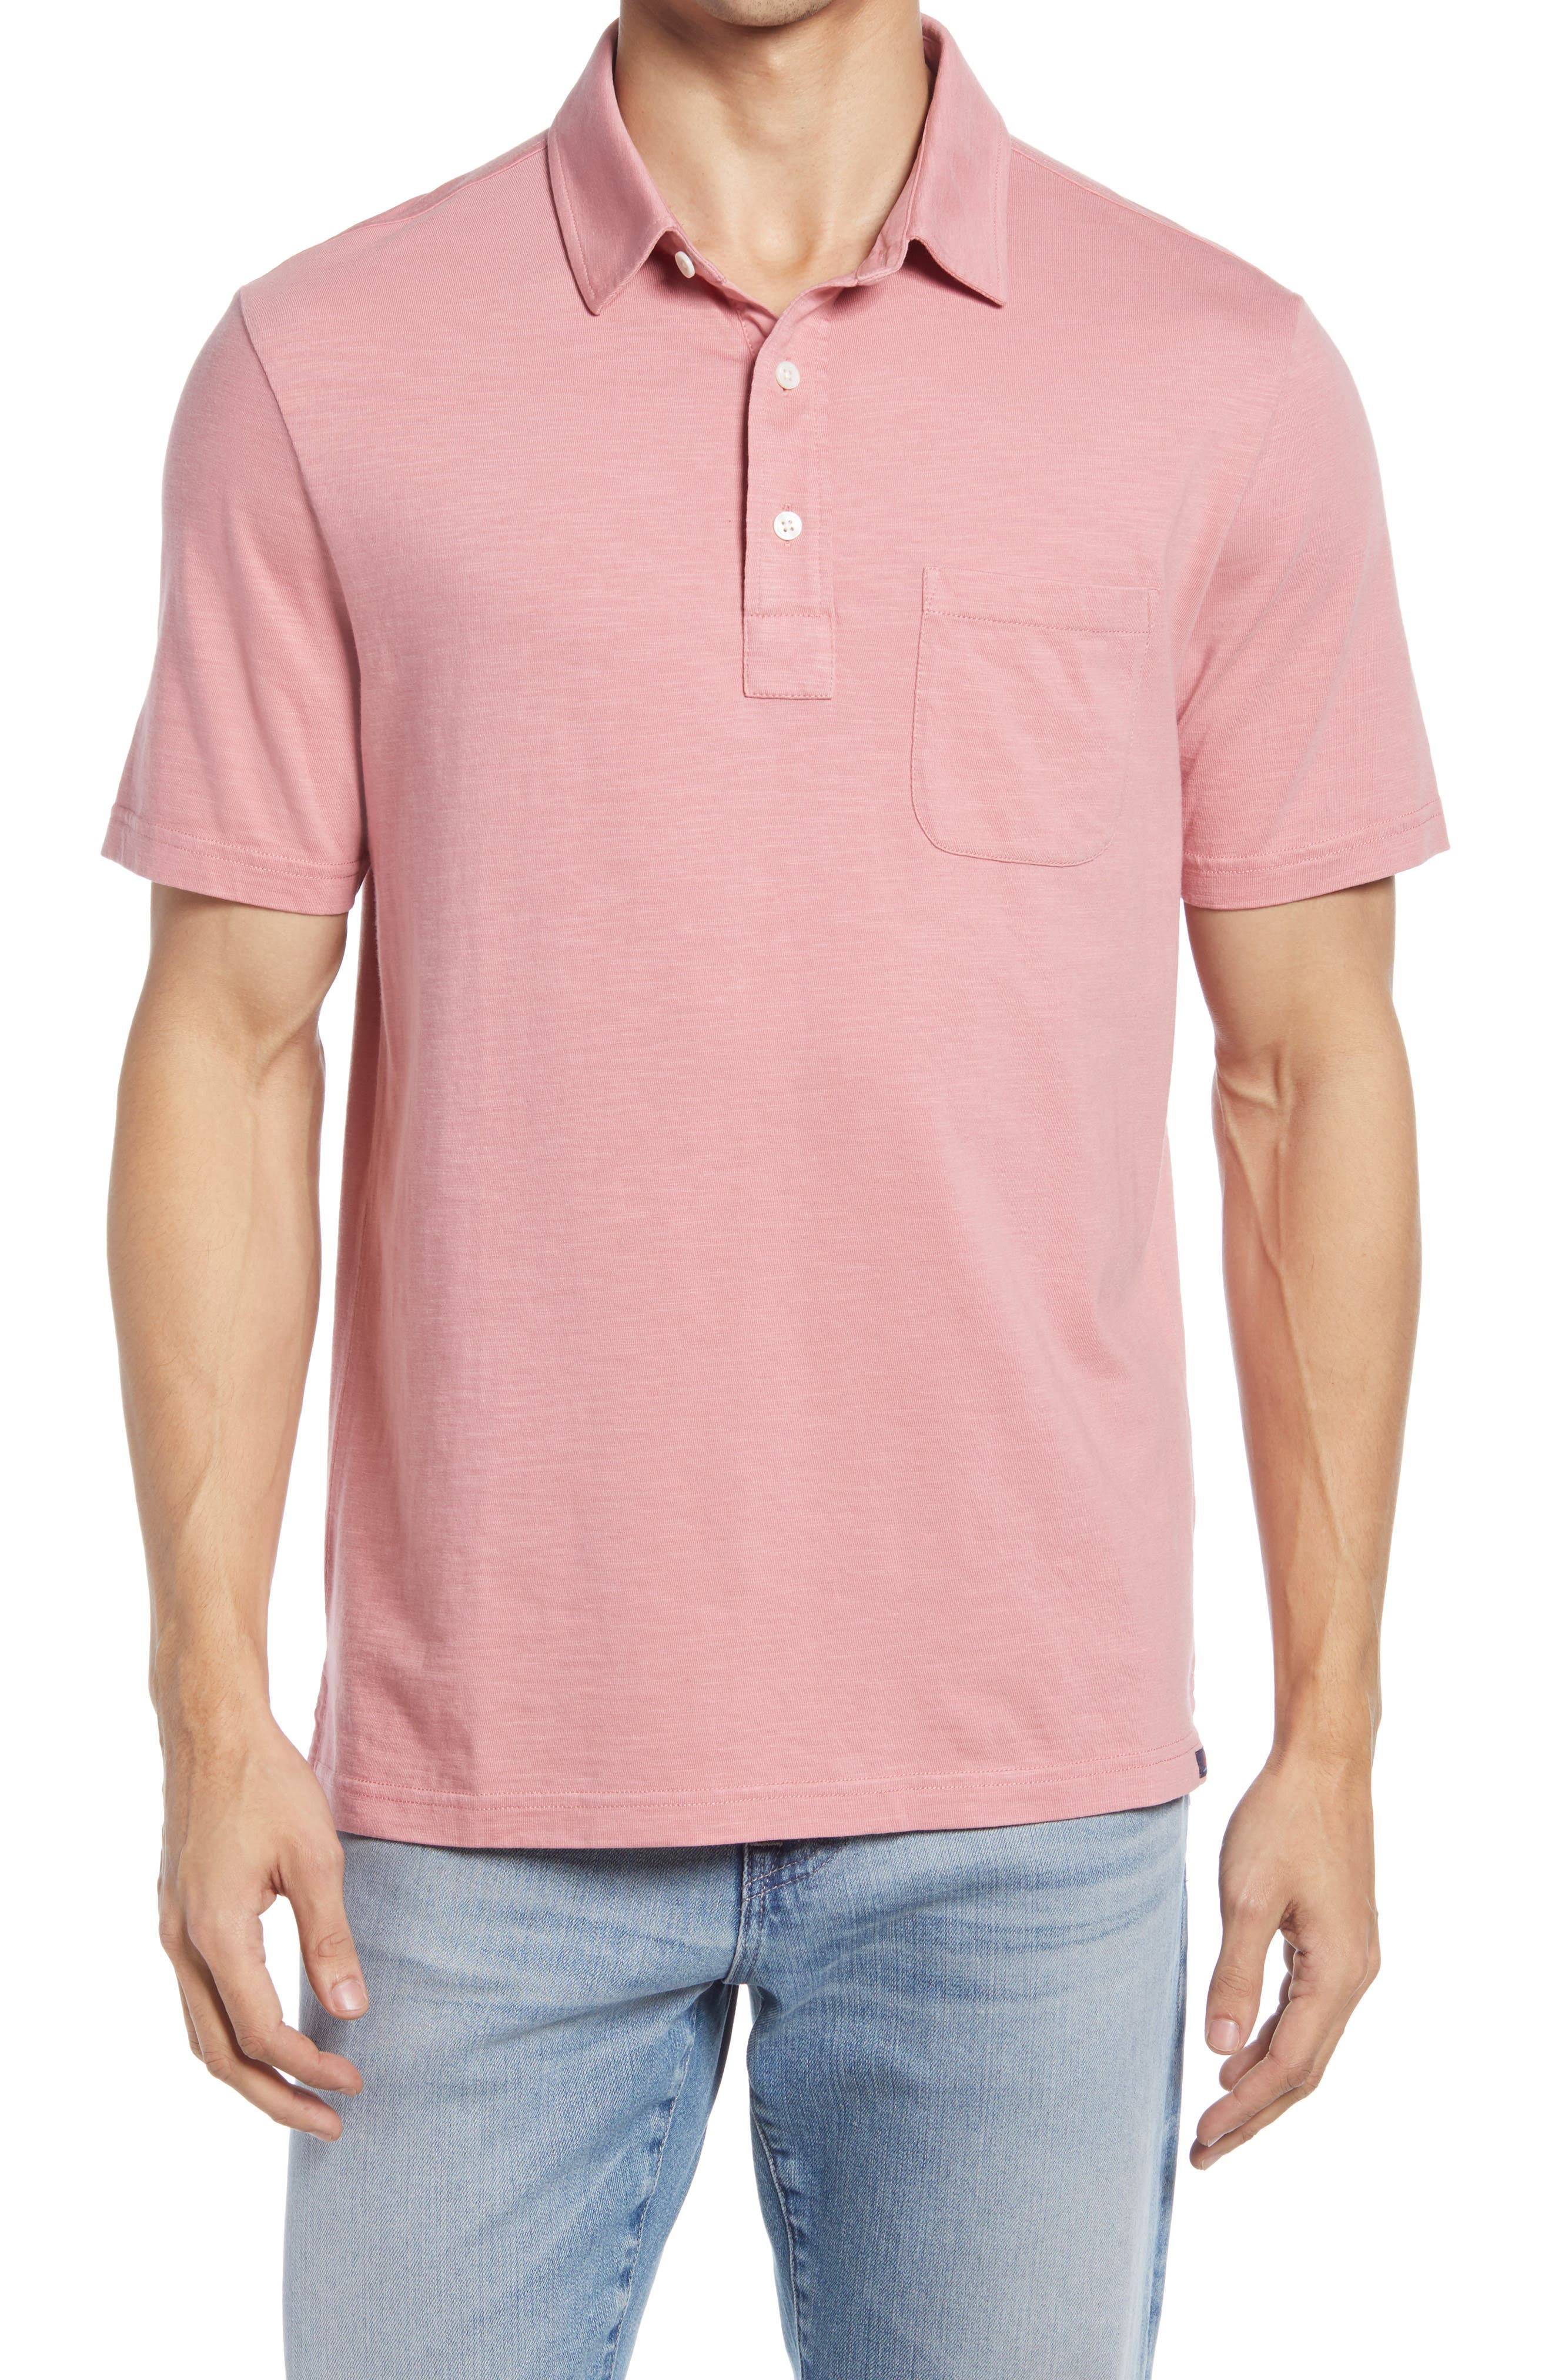 Sunwashed Organic Cotton Polo